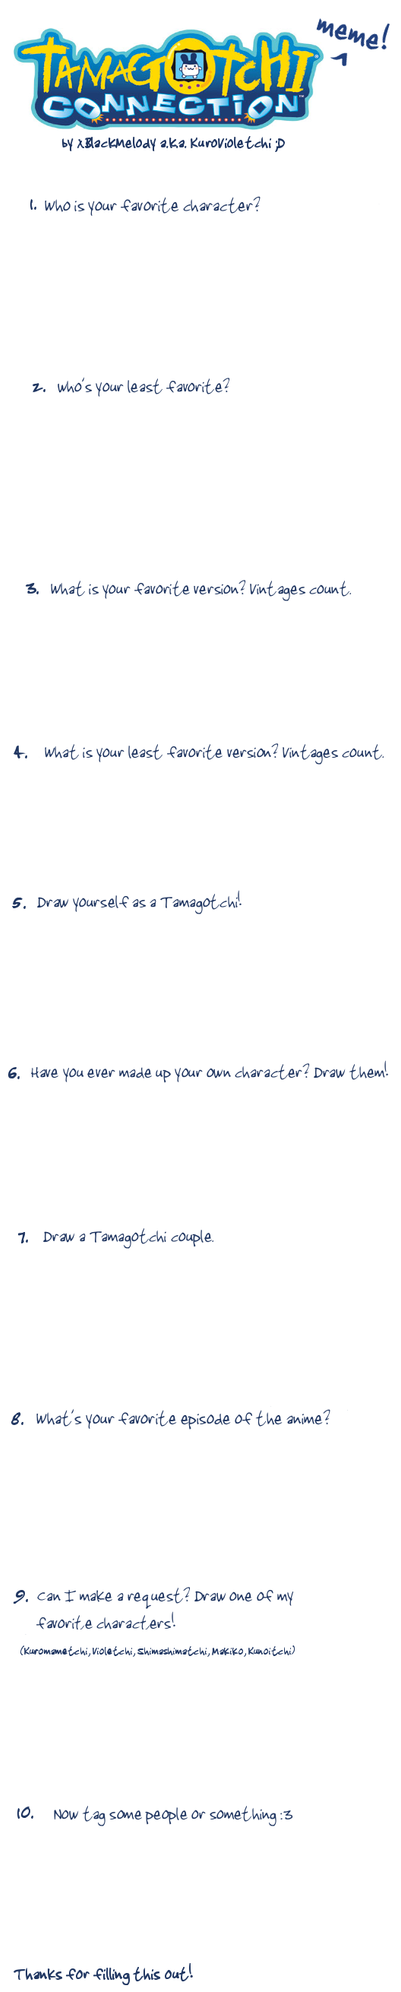 Tamagotchi Meme by xBlackMelody